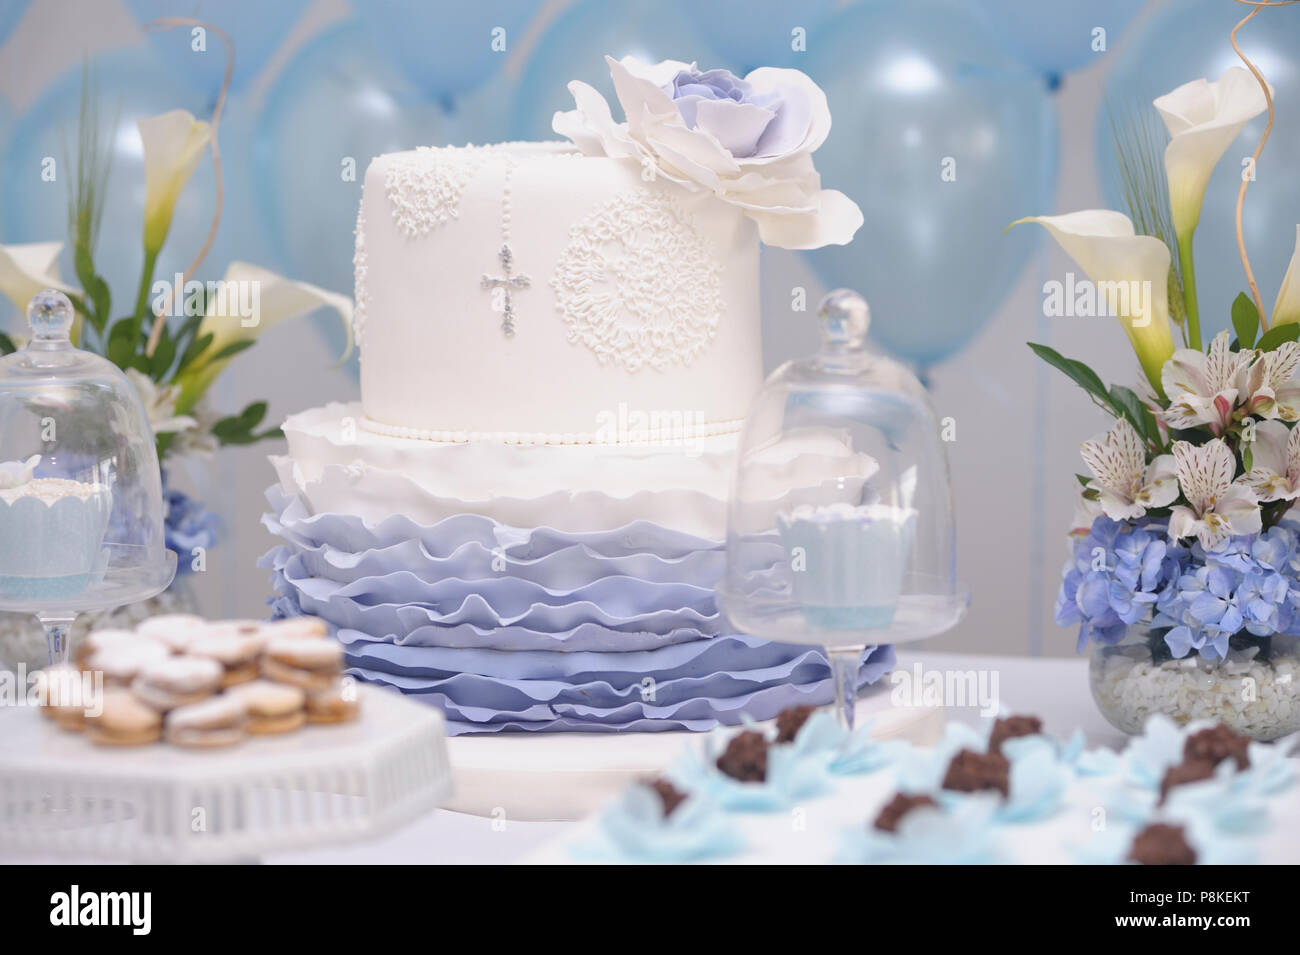 Pastel Para Bautizo Catolico Foto Imagen De Stock 211870284 Alamy